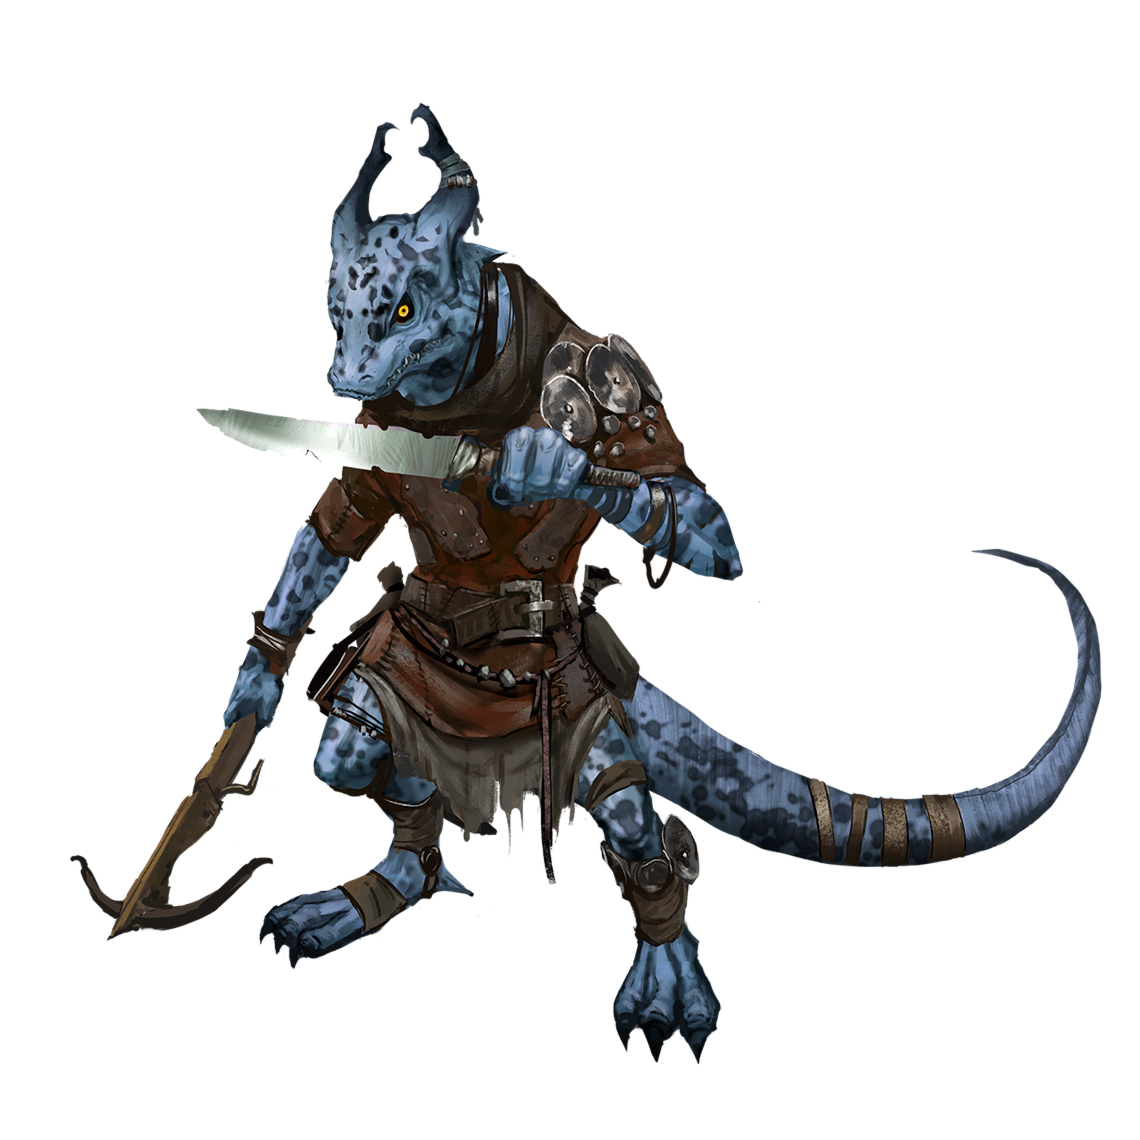 Male Blue Kobold Rogue Scout Pathfinder 2e Pfrpg Pfsrd Dnd D D 3 5 4e 5e 5th Ed D20 Fantasy Kobold D D Character Design Inspiration Fantasy Character Design